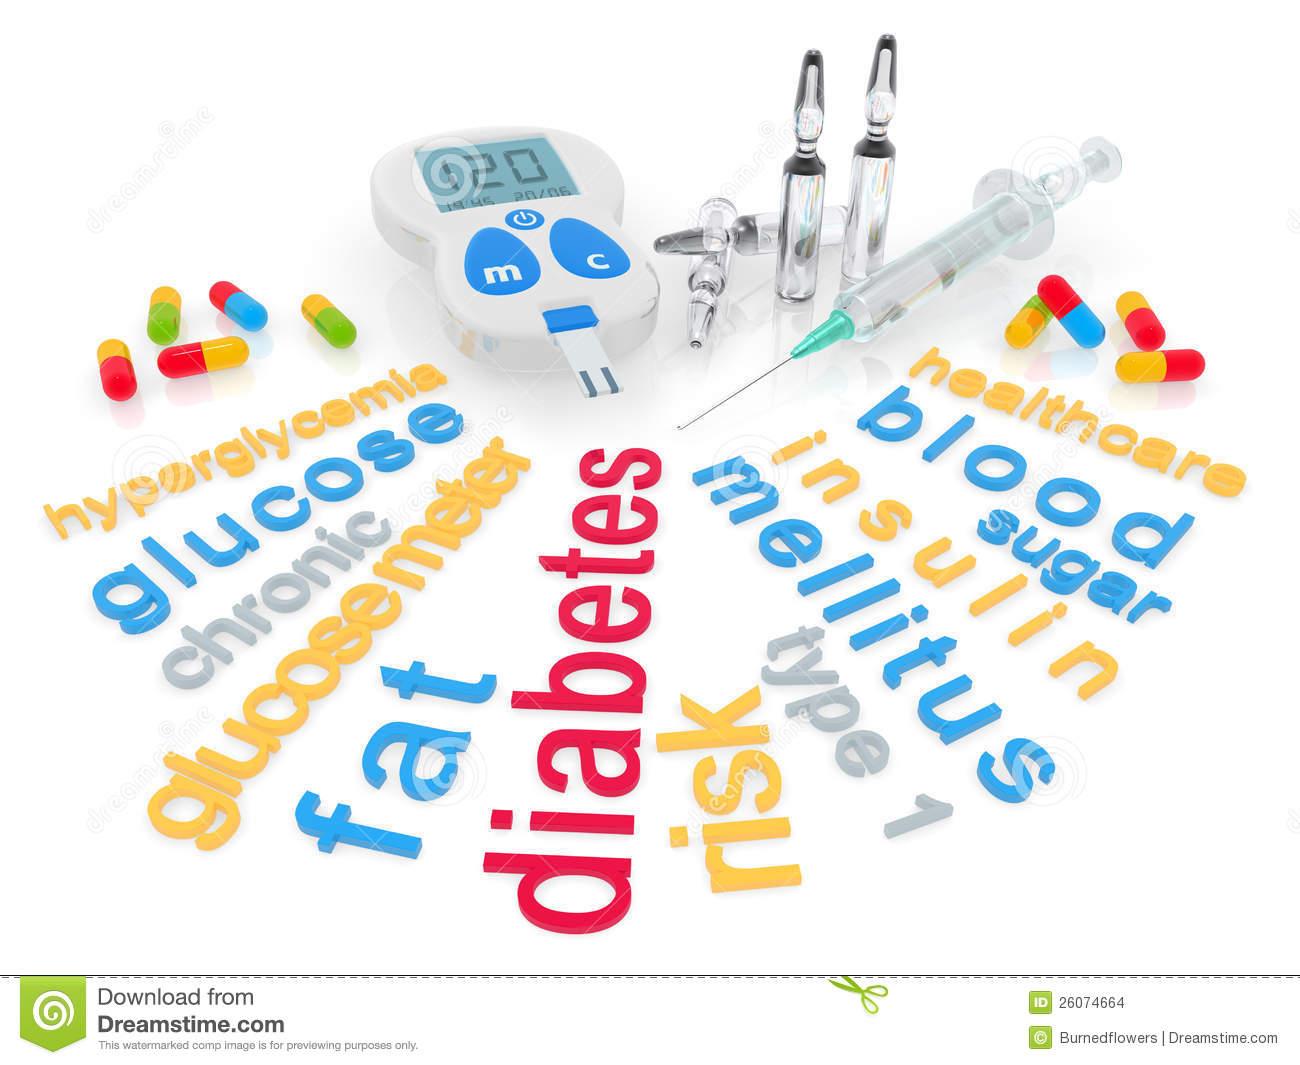 Diabetes clipart free jpg transparent download Diabetes Clip Art Pictures | Clipart Panda - Free Clipart Images jpg transparent download